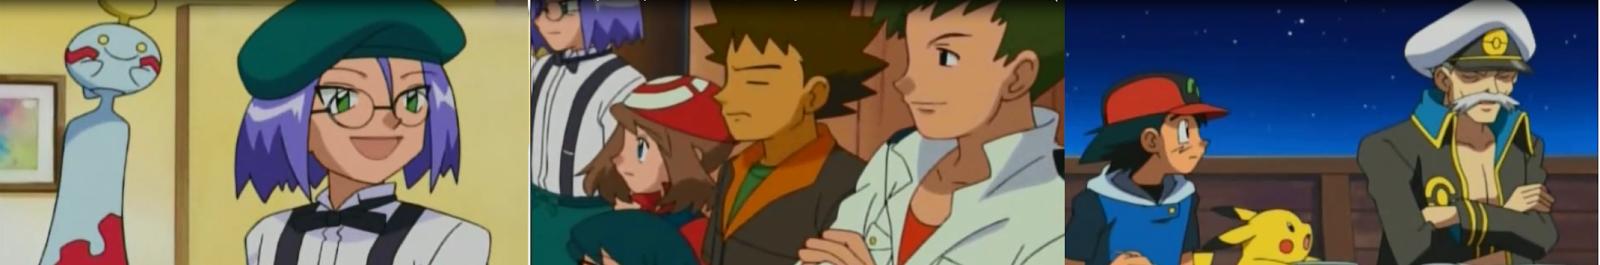 Pokemon Capitulo 9 Temporada 8 Asunto De Vanidad